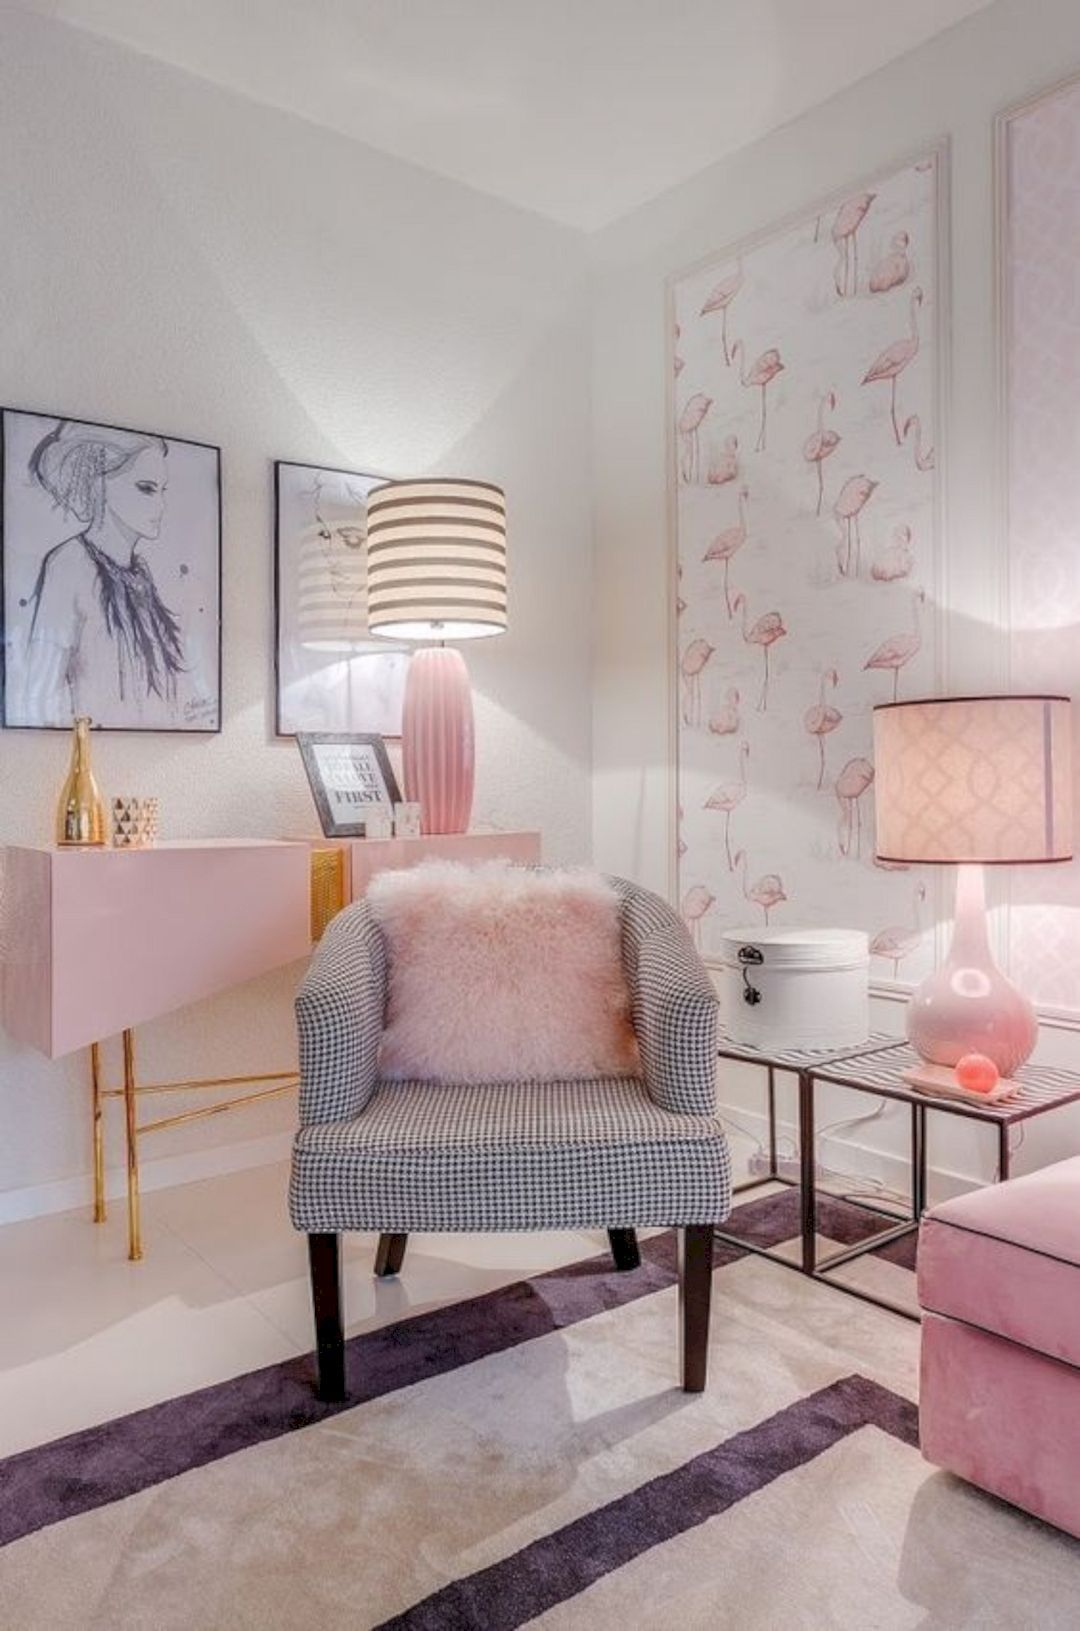 18 Diy Room Decor Ideas For Crafters: 18 Cute DIY Girly Home Decor Ideas